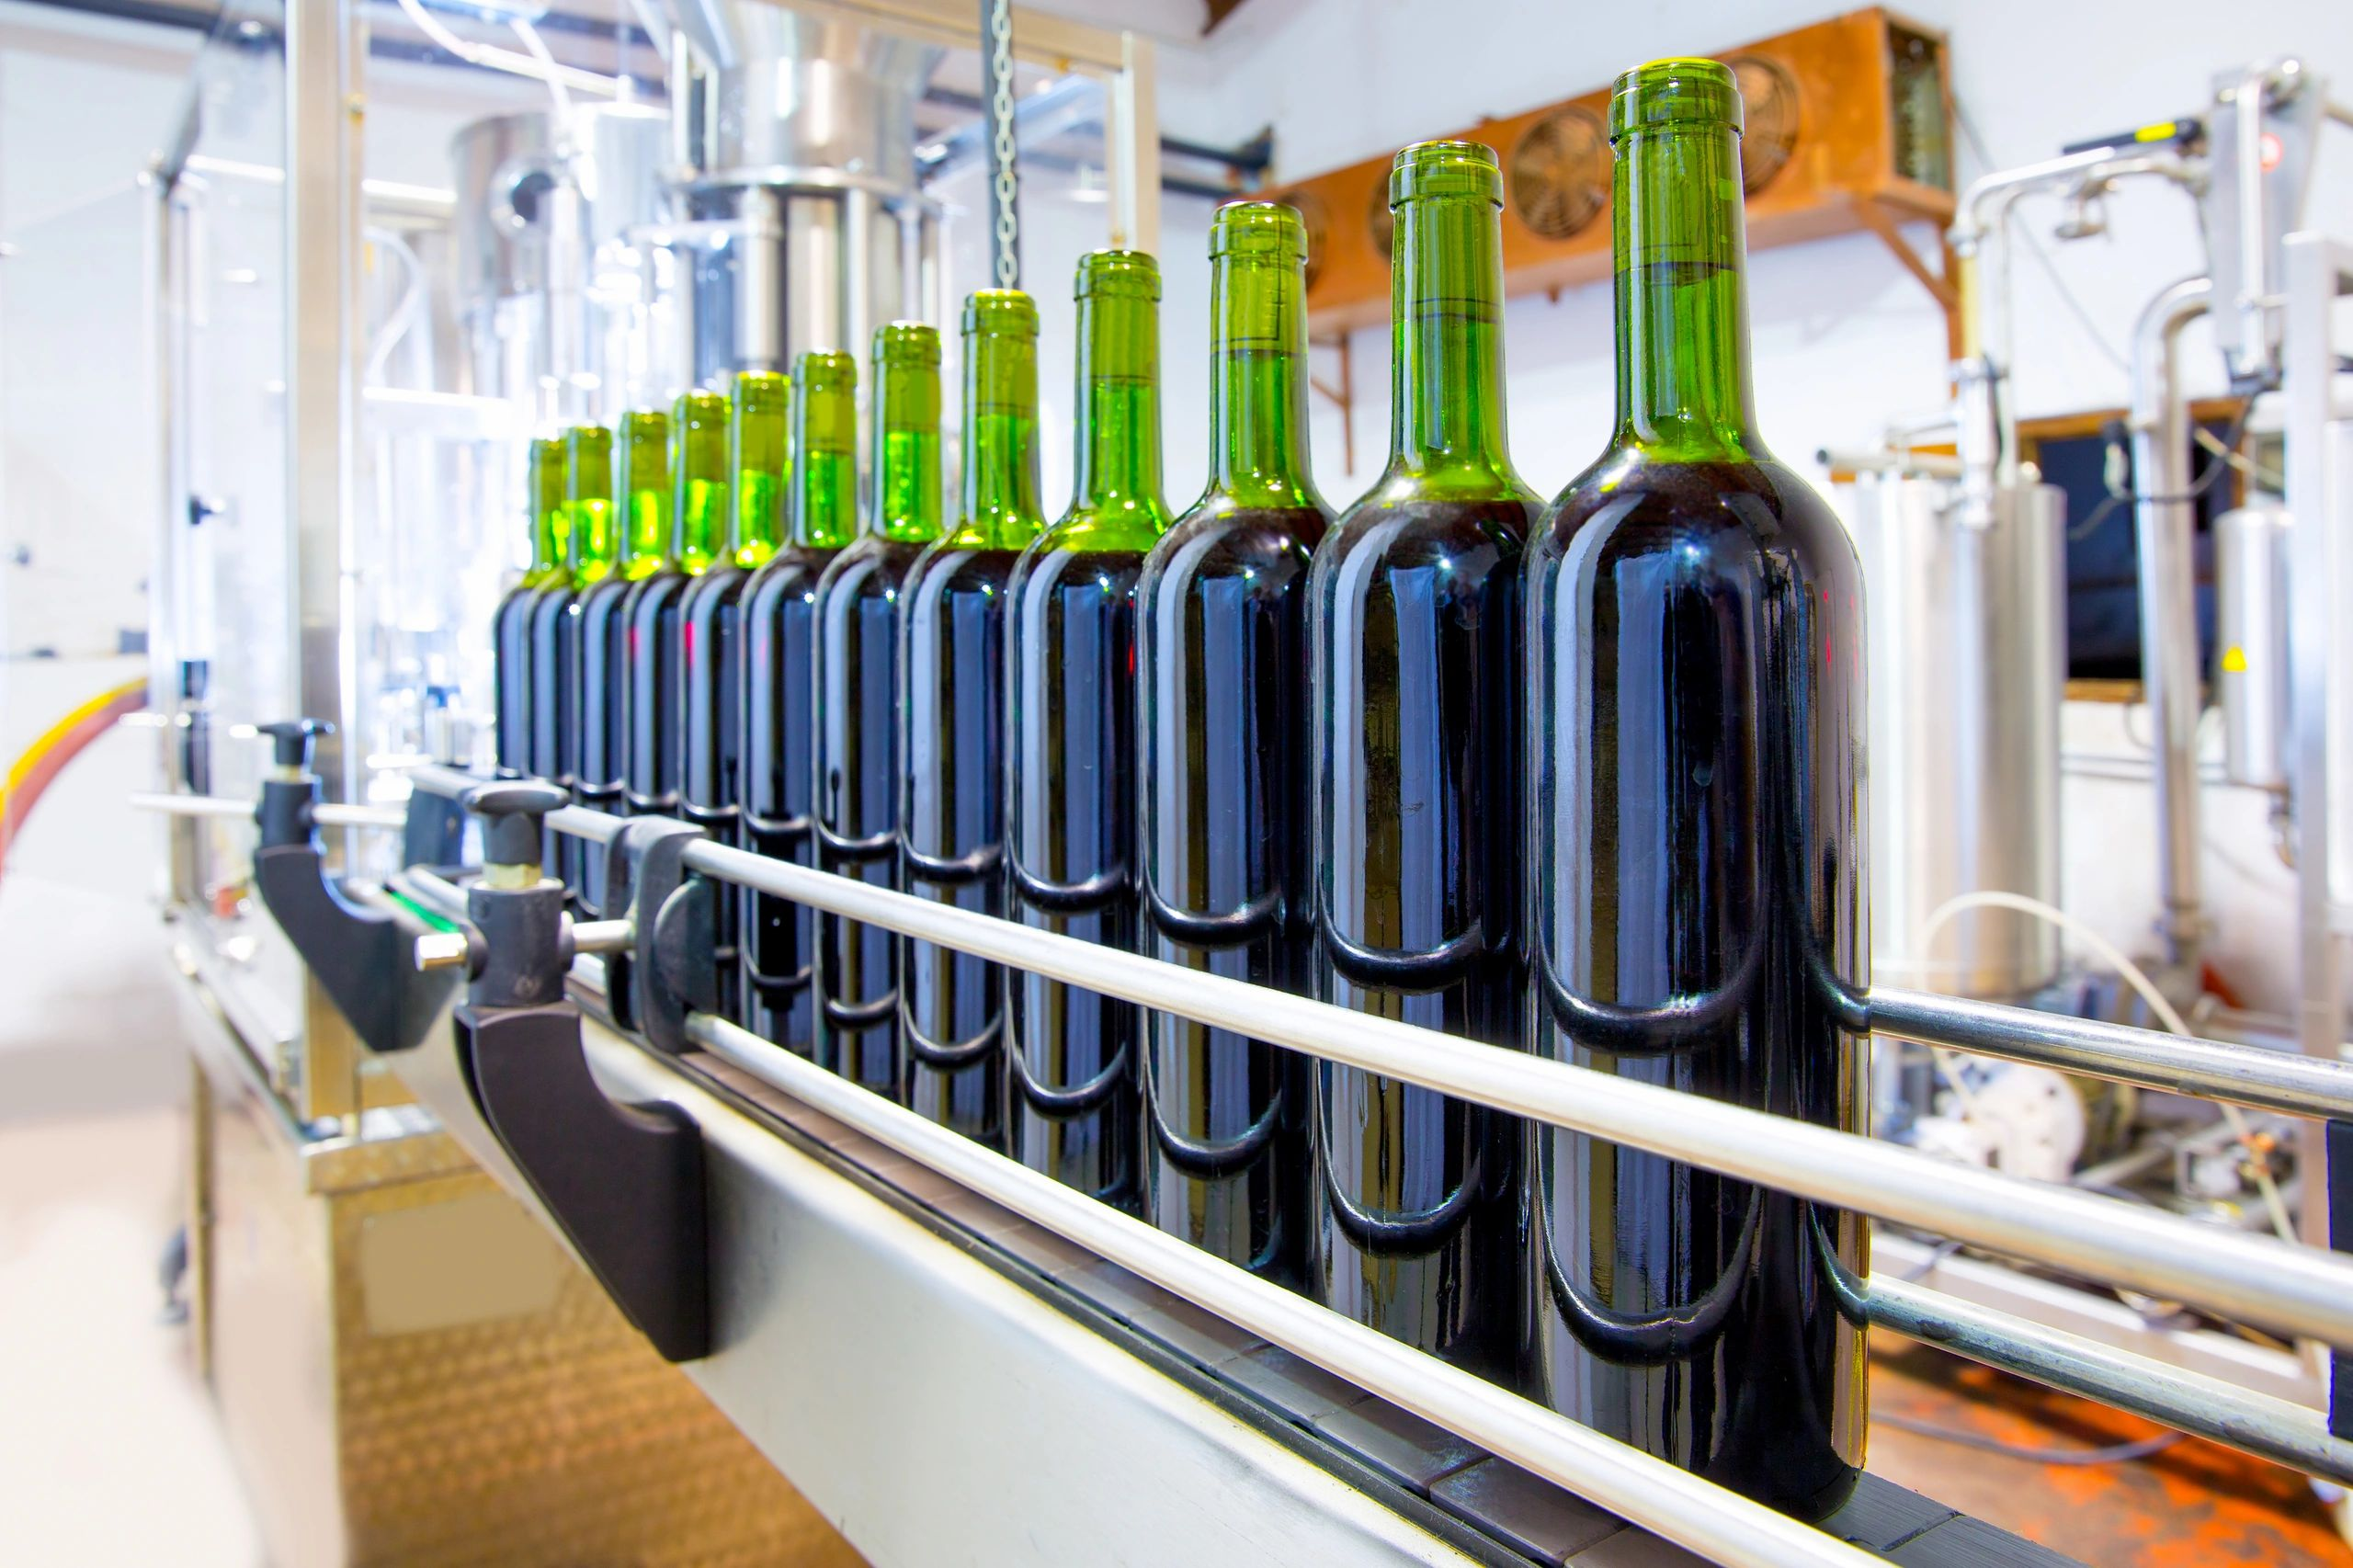 CarolinaCoPacking - Bottling, Copacker, BBQ Sauce